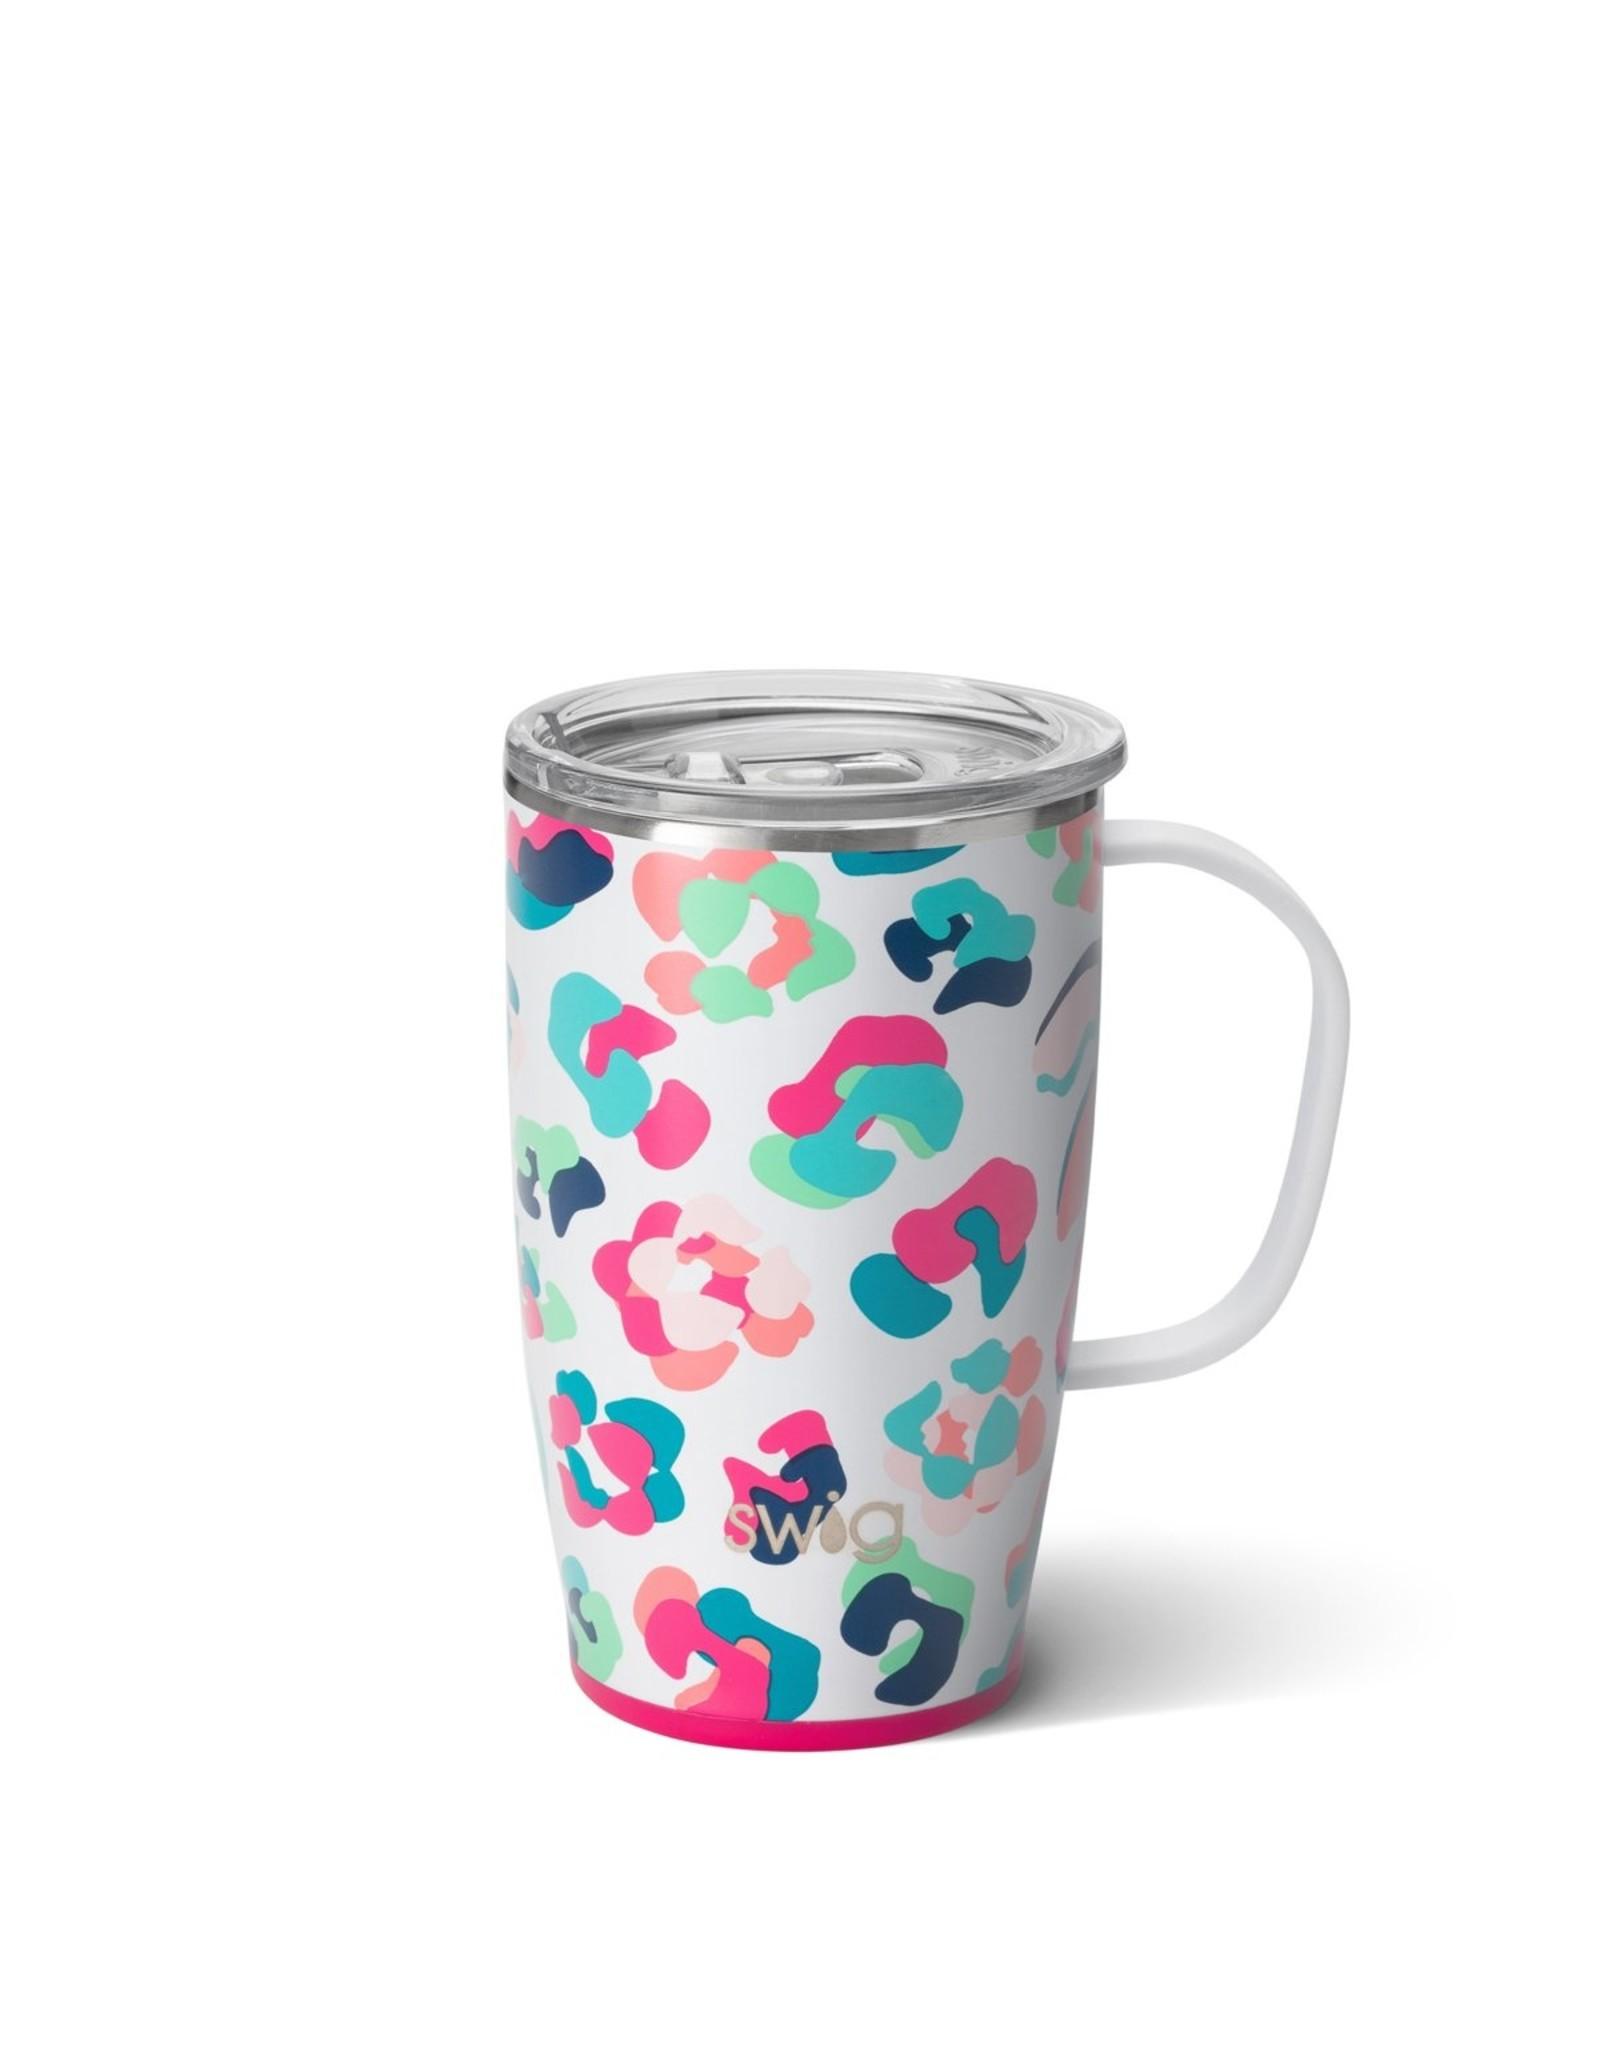 Swig 18 oz Mug - Party Animal